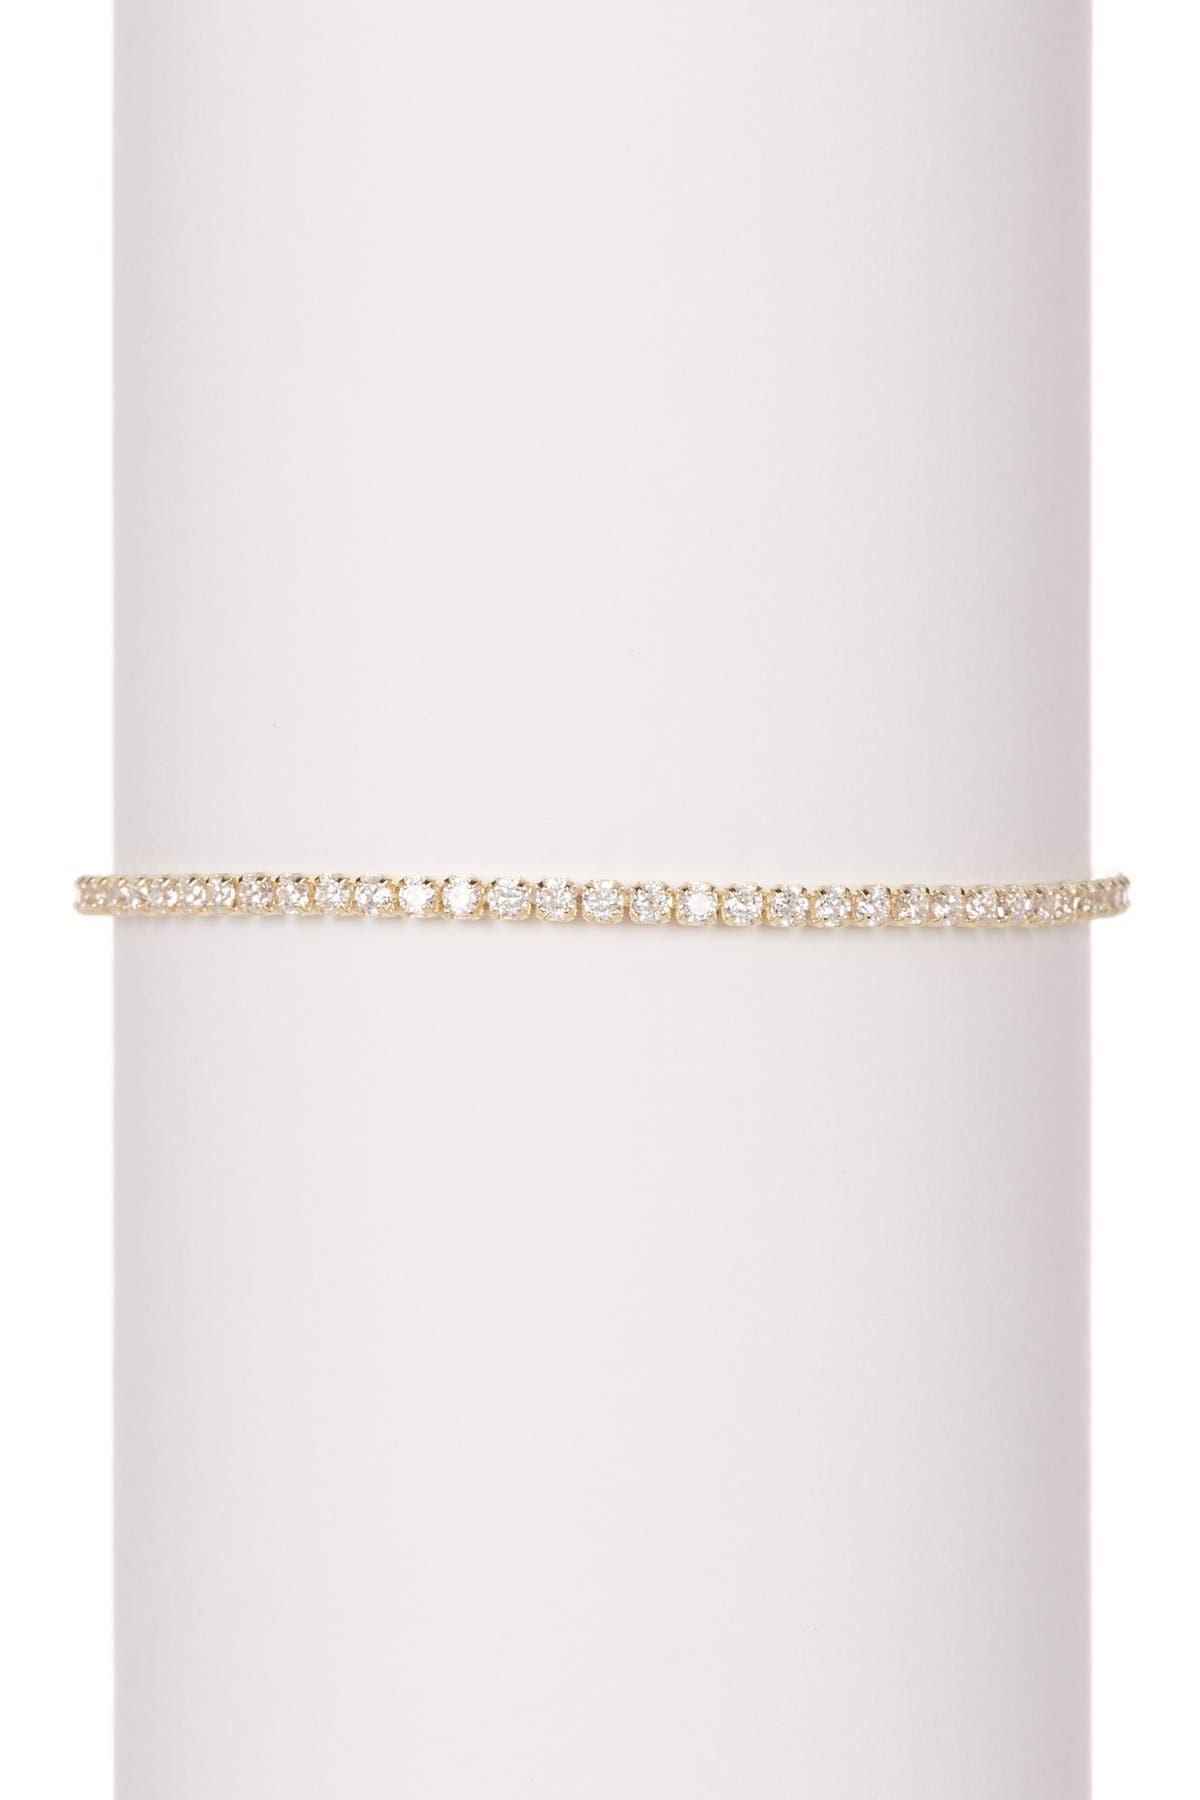 Image of Savvy Cie 18K Gold Vermeil CZ Pull Tennis Bracelet